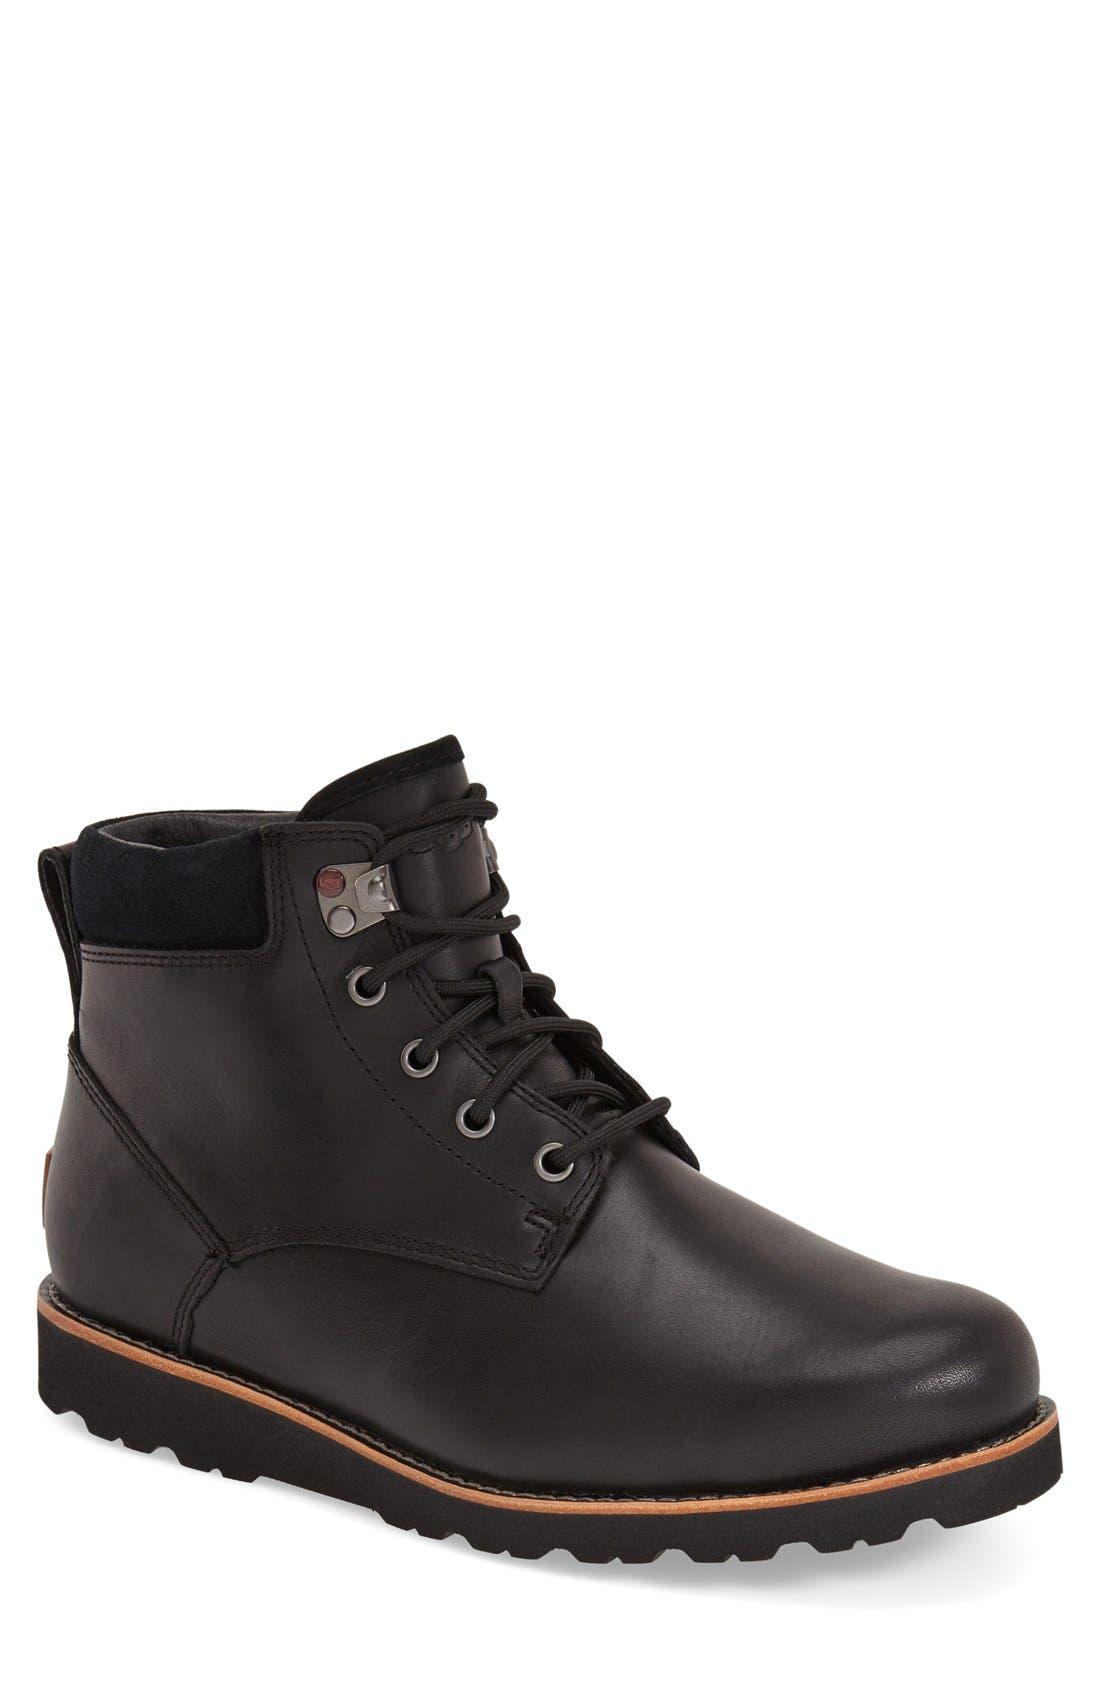 Ugg Seton Waterproof Chukka Boot, Black